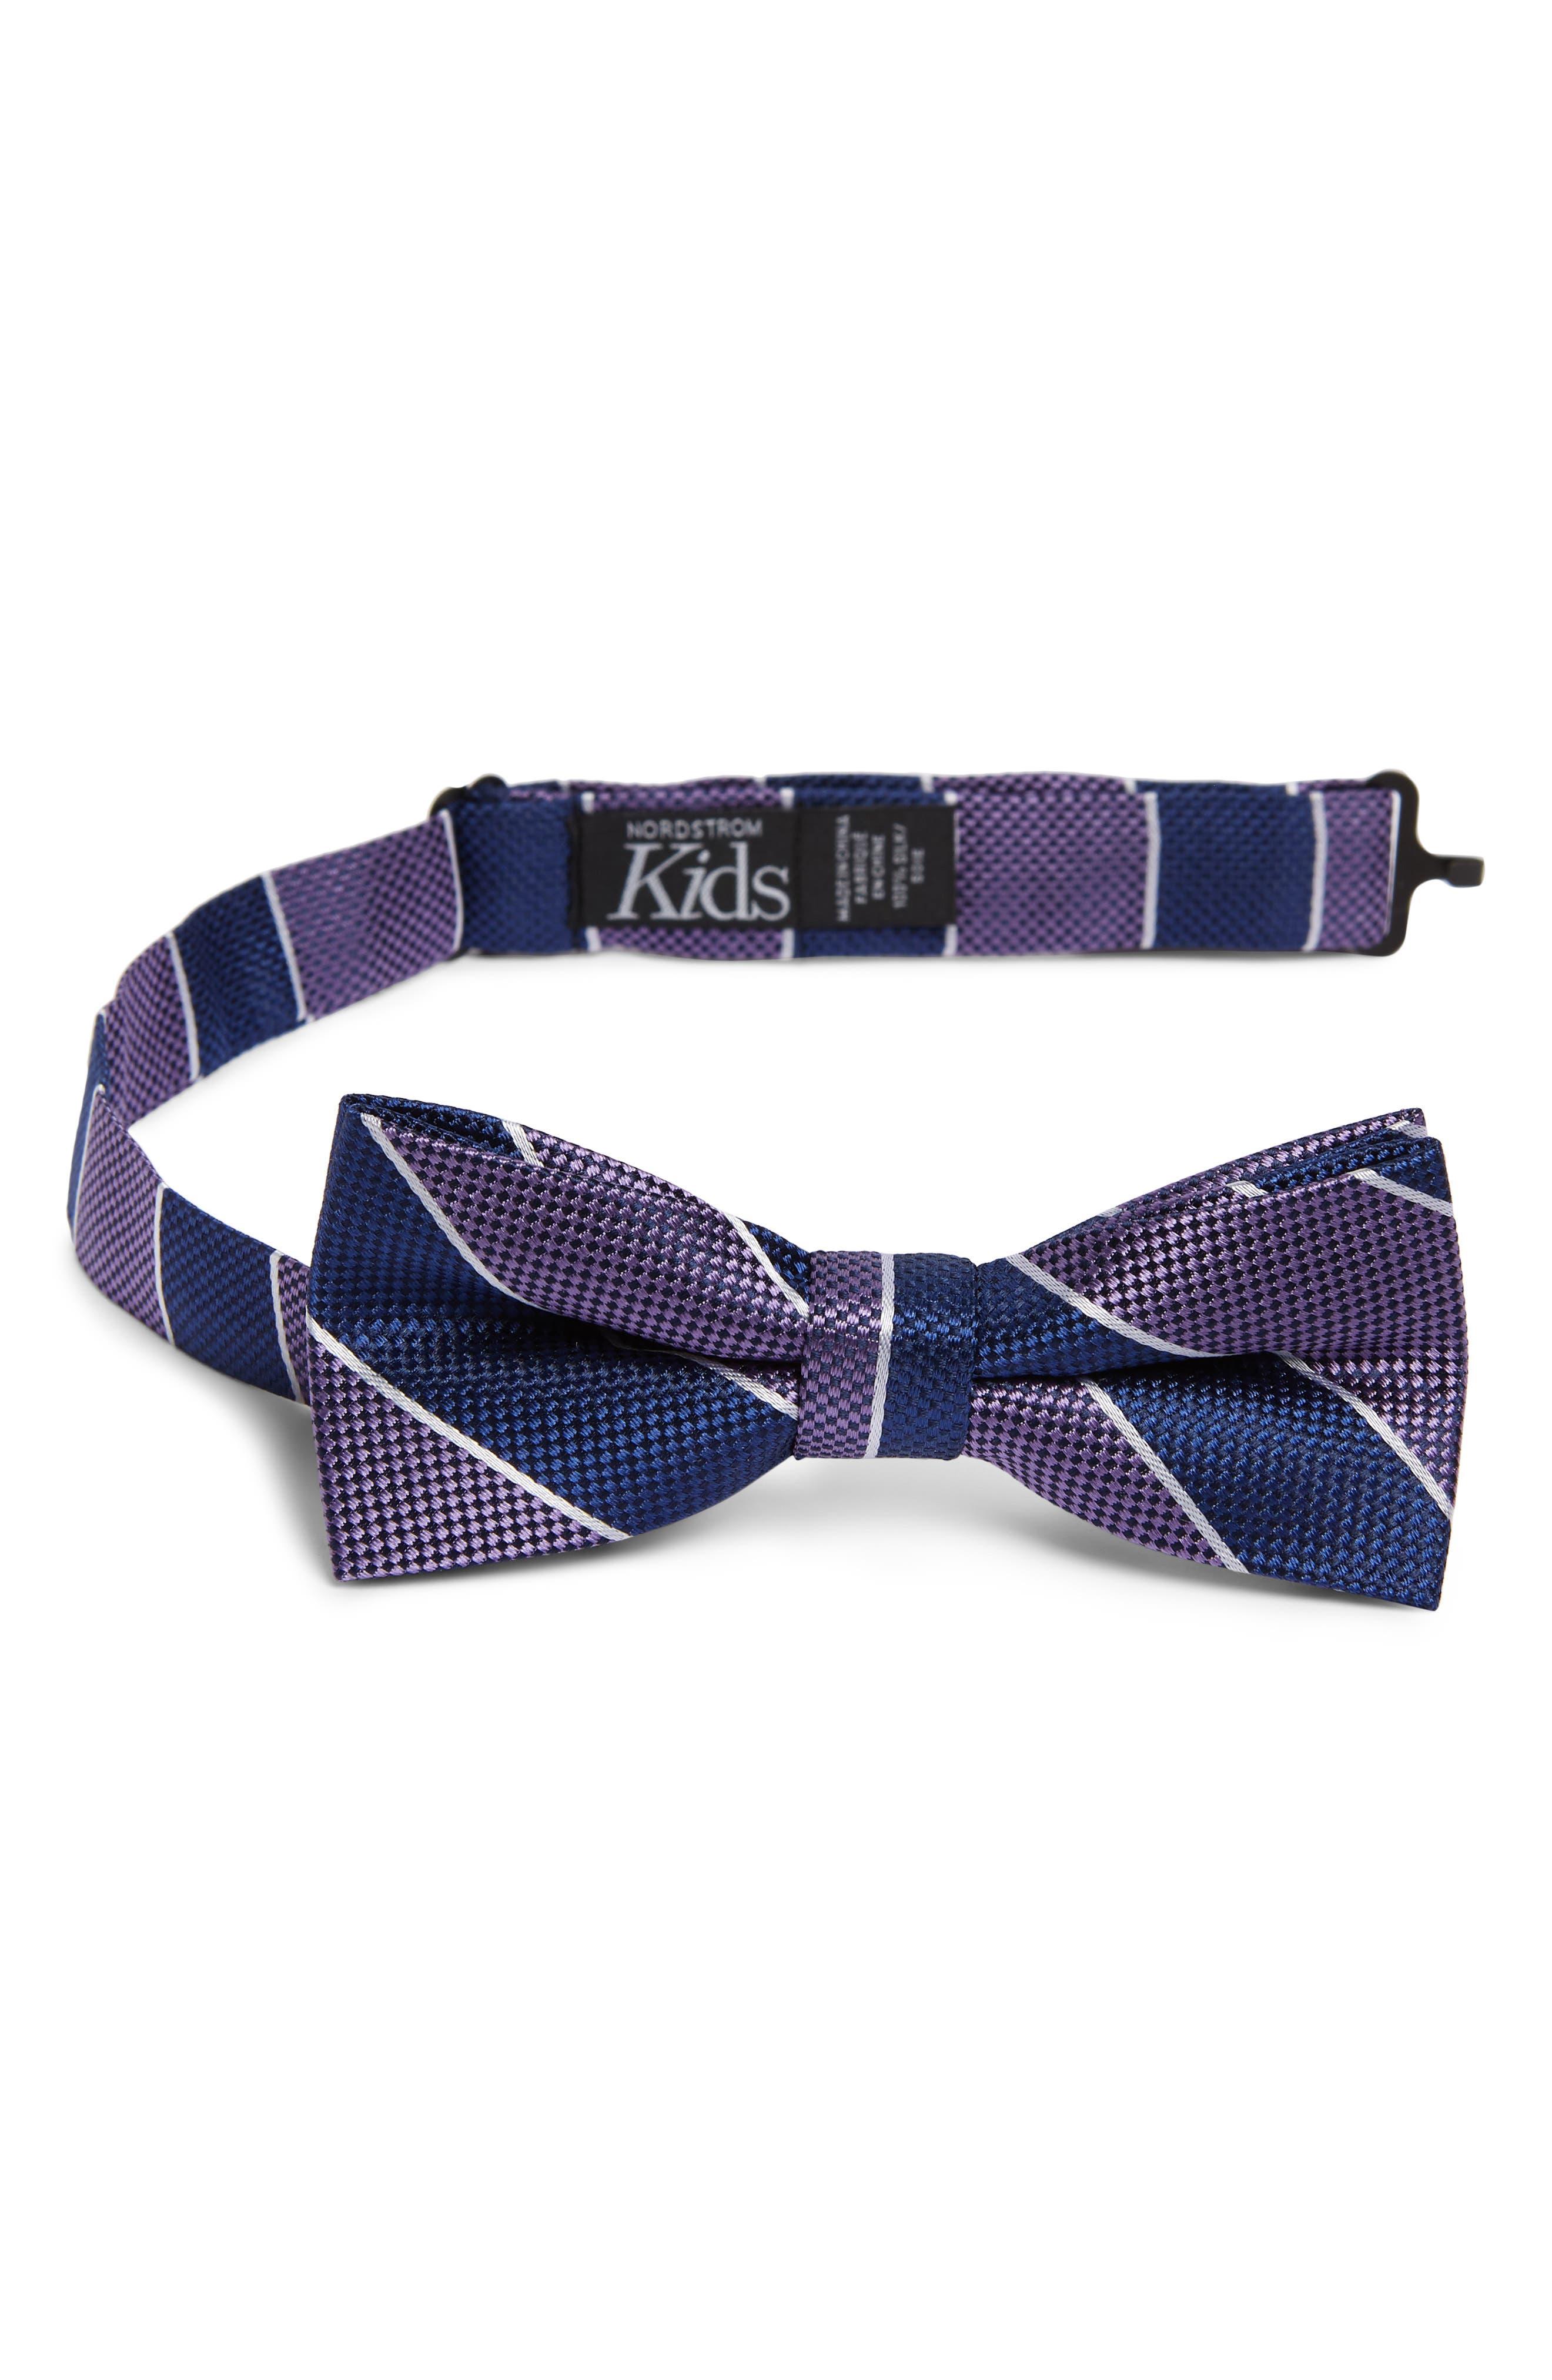 NORDSTROM, Harrison Stripe Silk Bow Tie, Main thumbnail 1, color, PURPLE